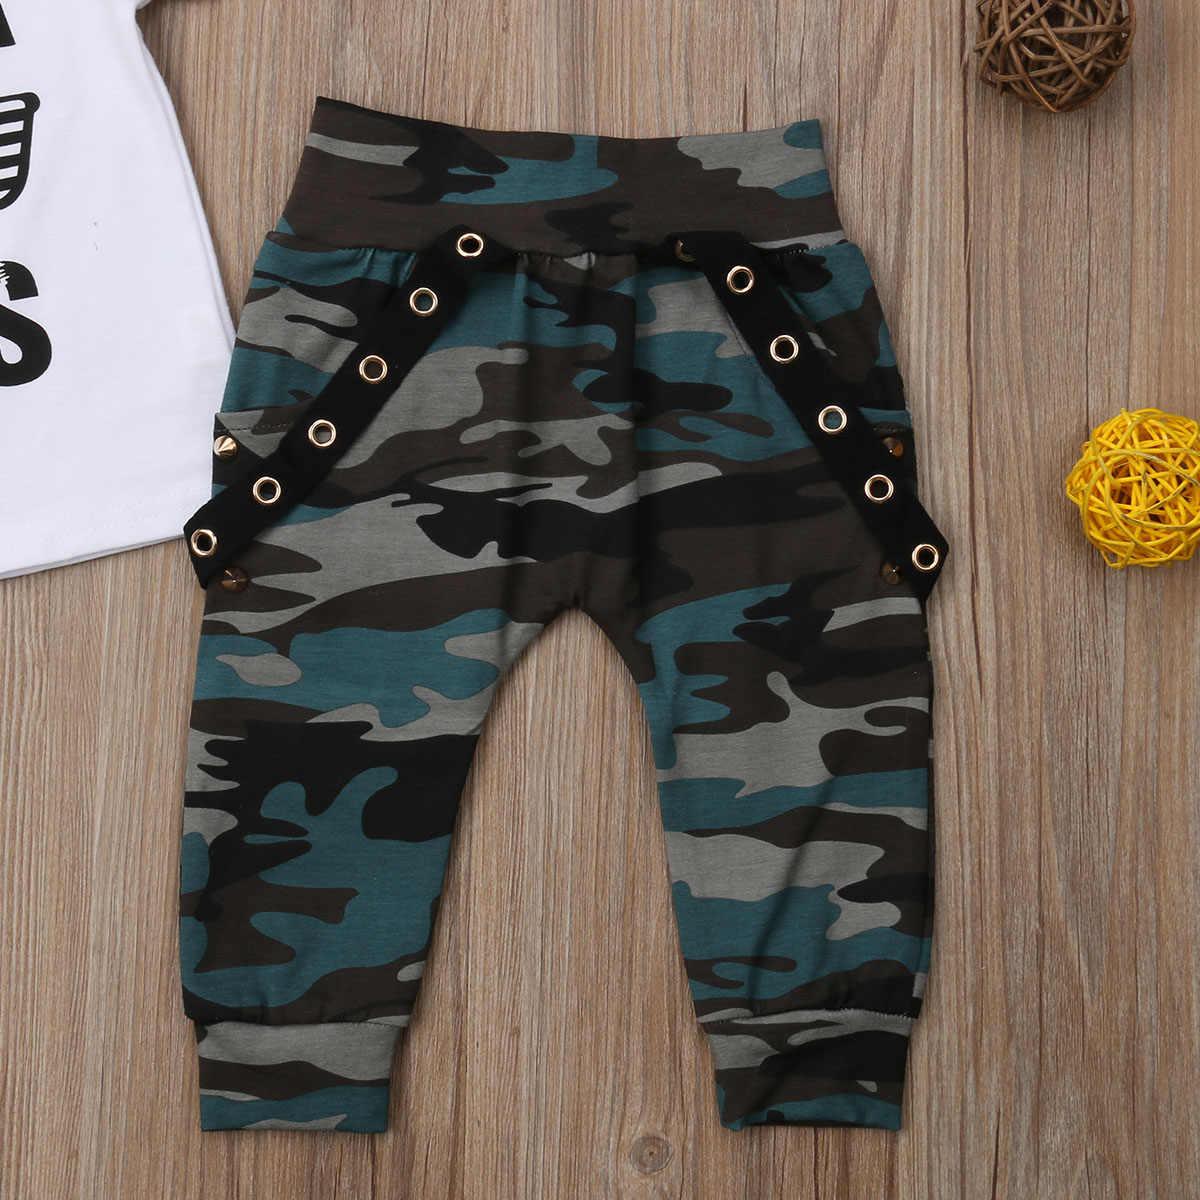 f88a3c74f ... 2Pcs Toddler Baby Boys Hip Hop Tops Short Sleeve T-shirt Camo Pants  Outfits Set ...